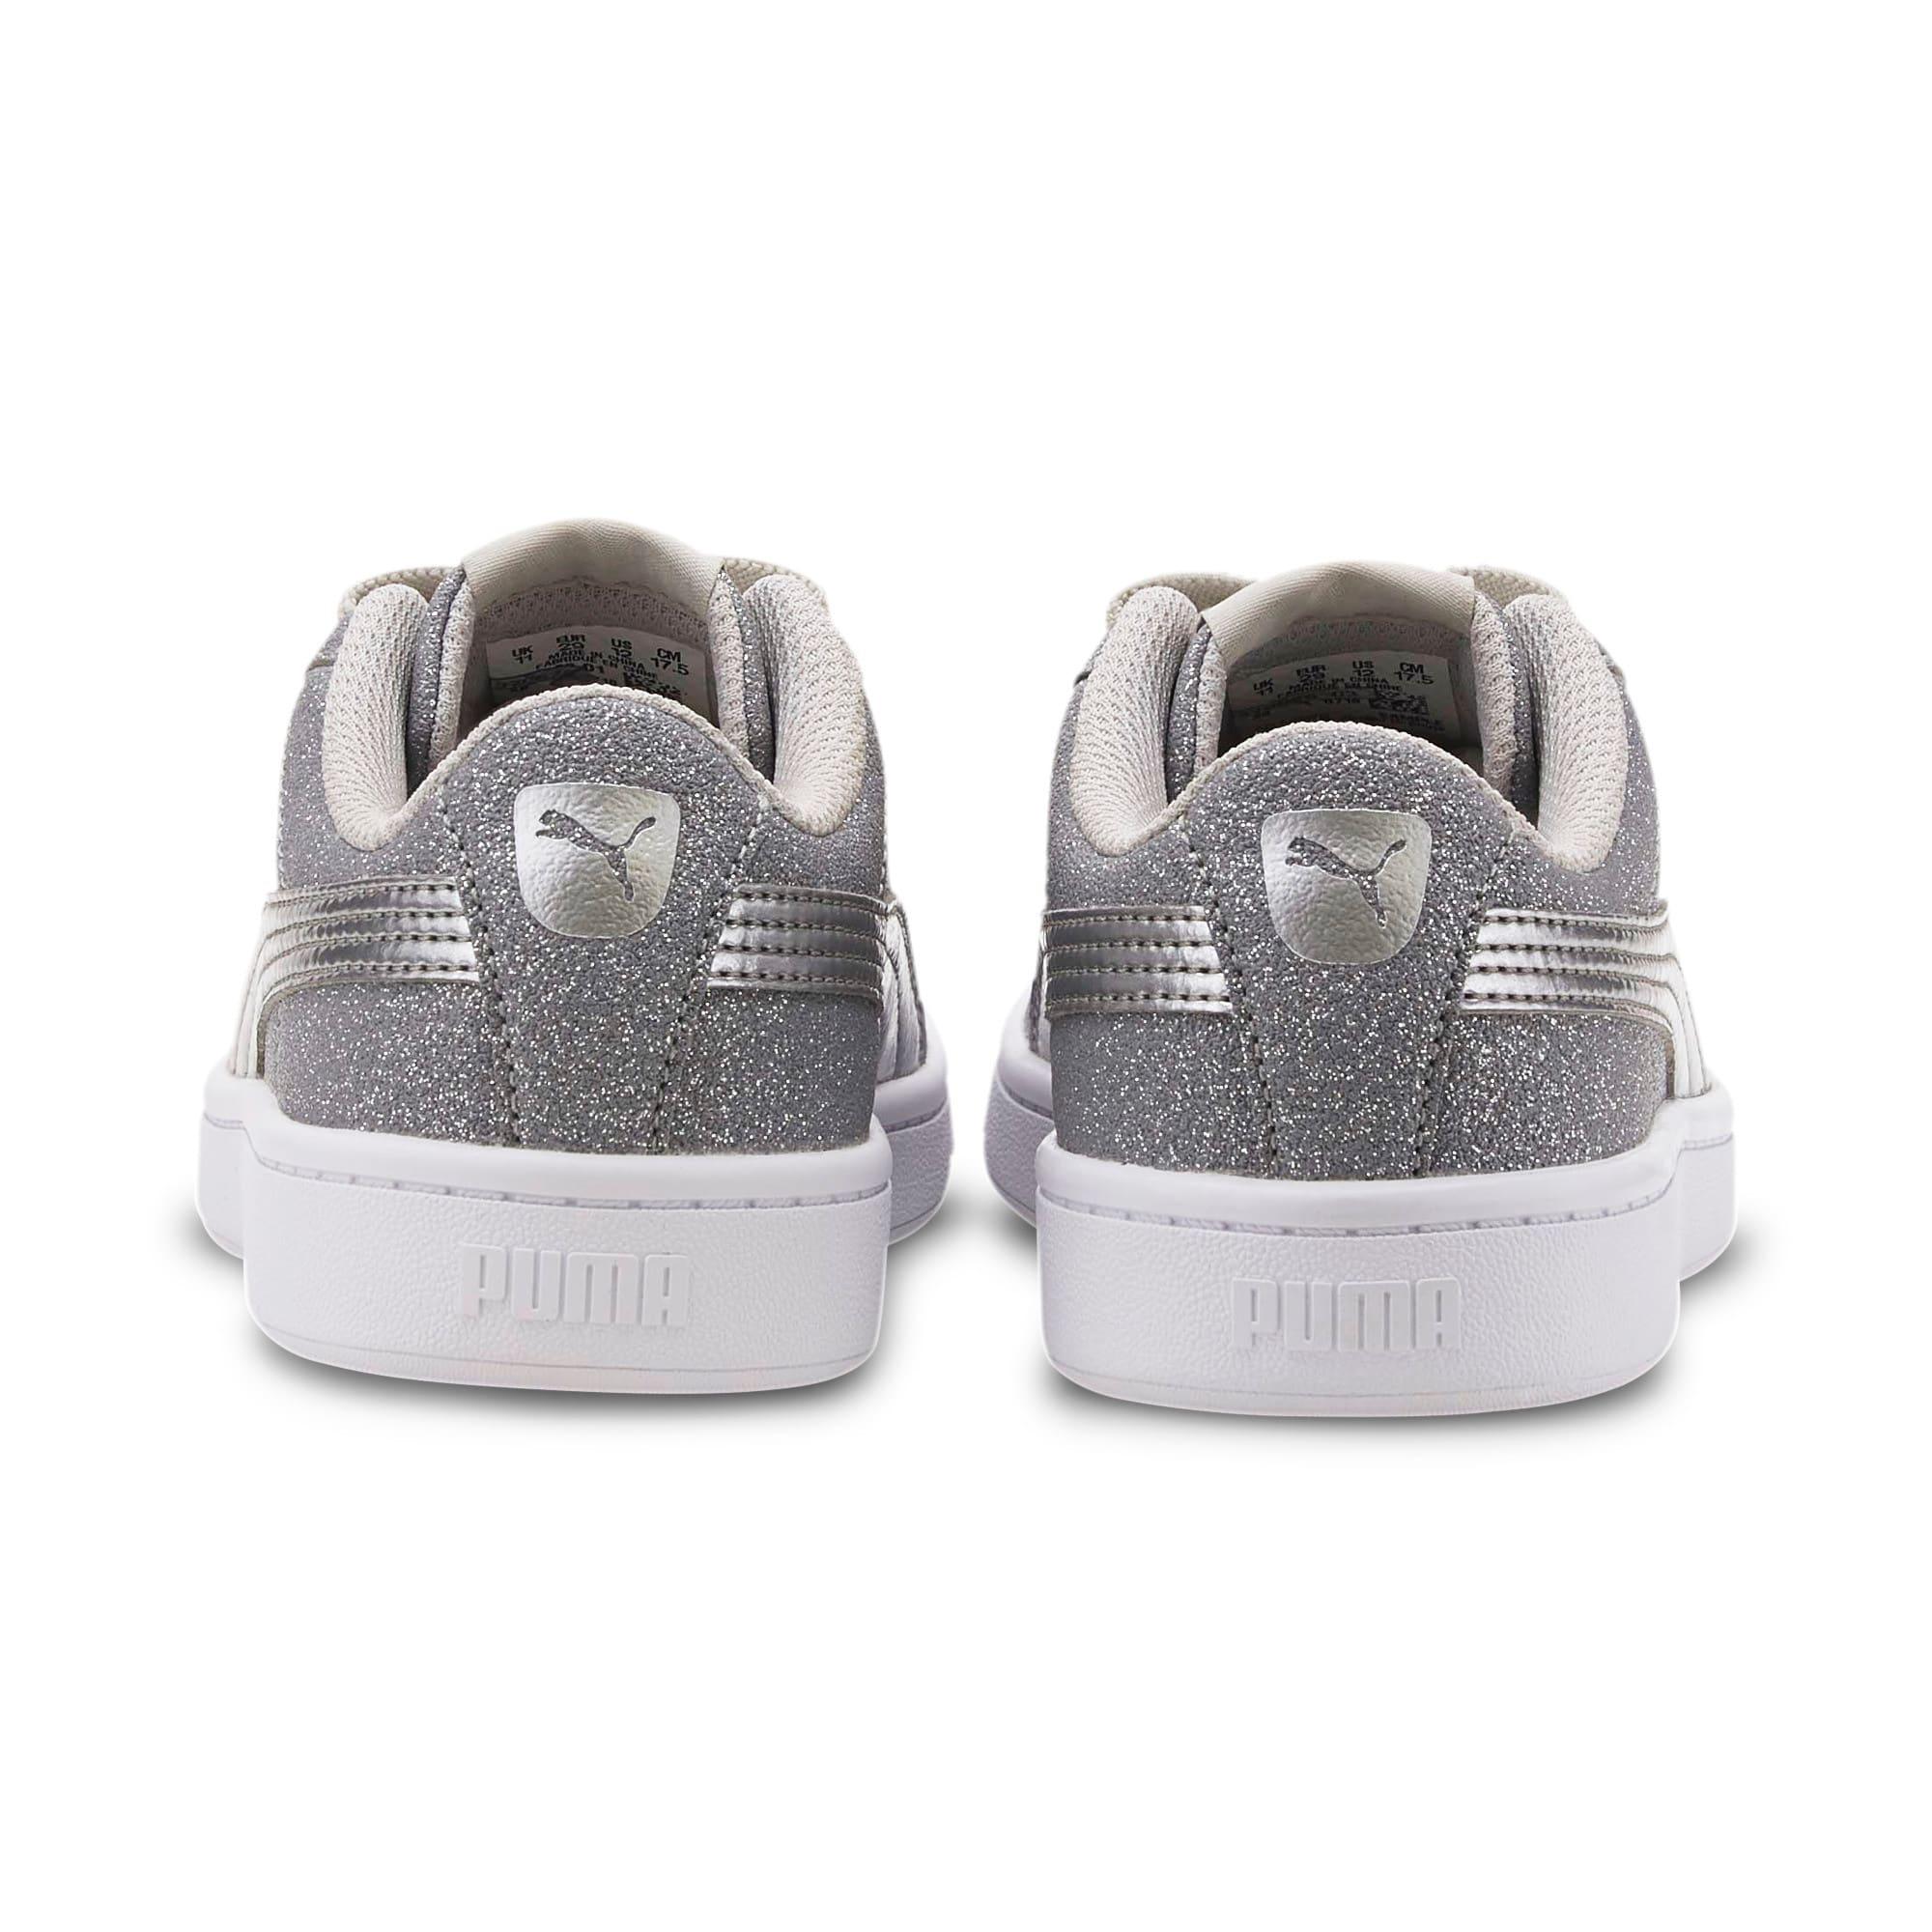 Thumbnail 3 of PUMA Vikky v2 Glitz AC Sneakers PS, Gray Violet-Silver-White, medium